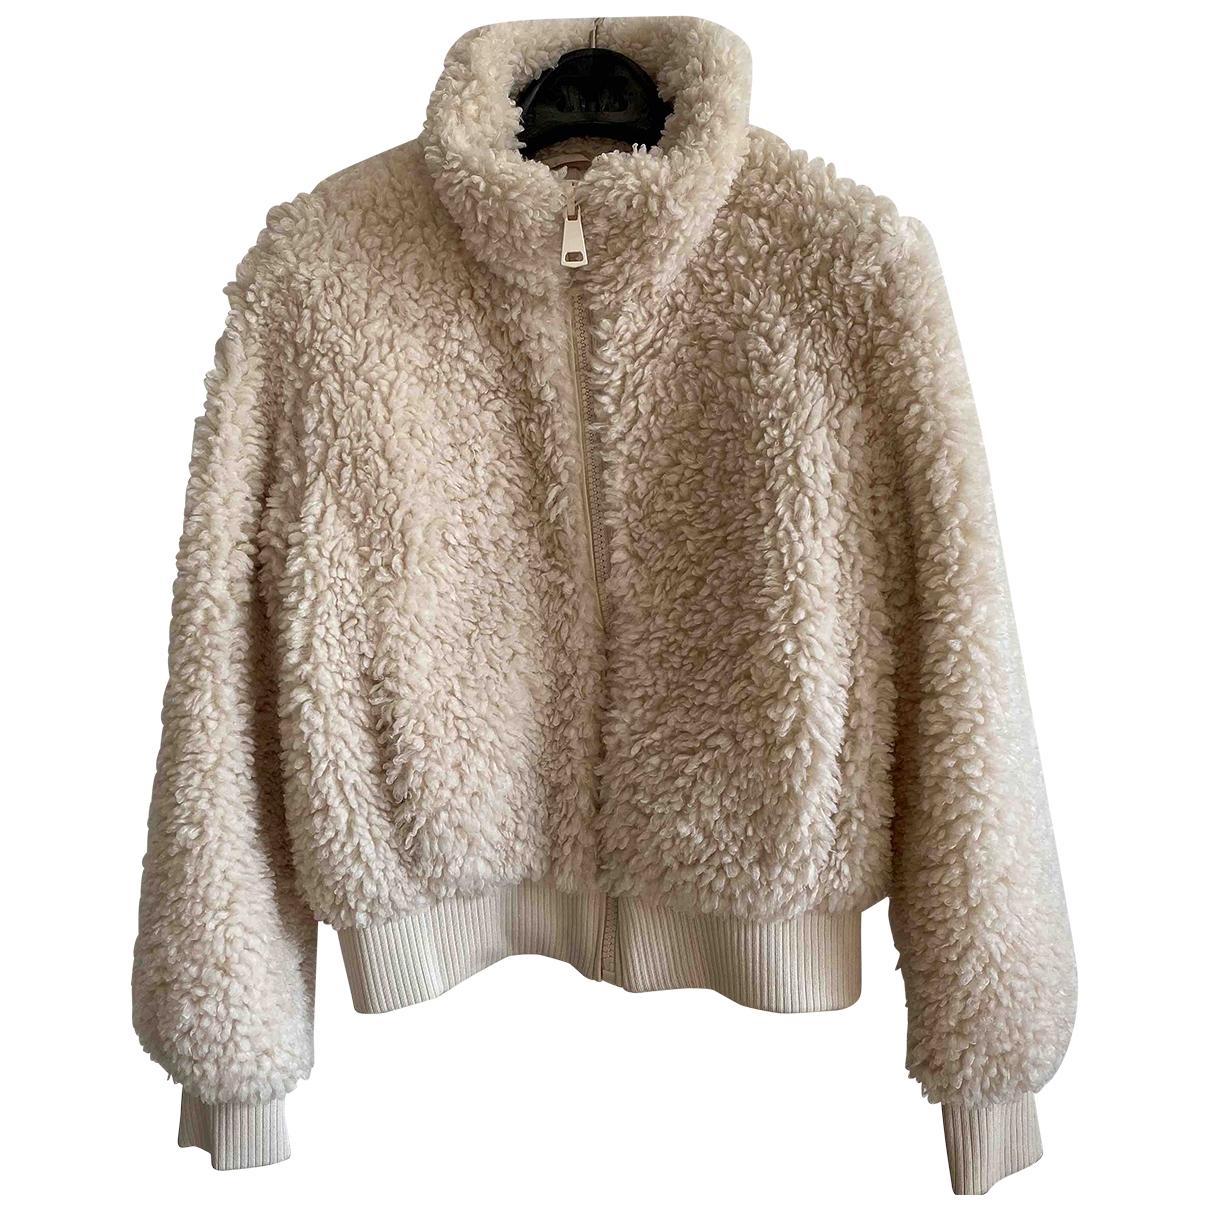 Zara \N Ecru jacket for Women XS International